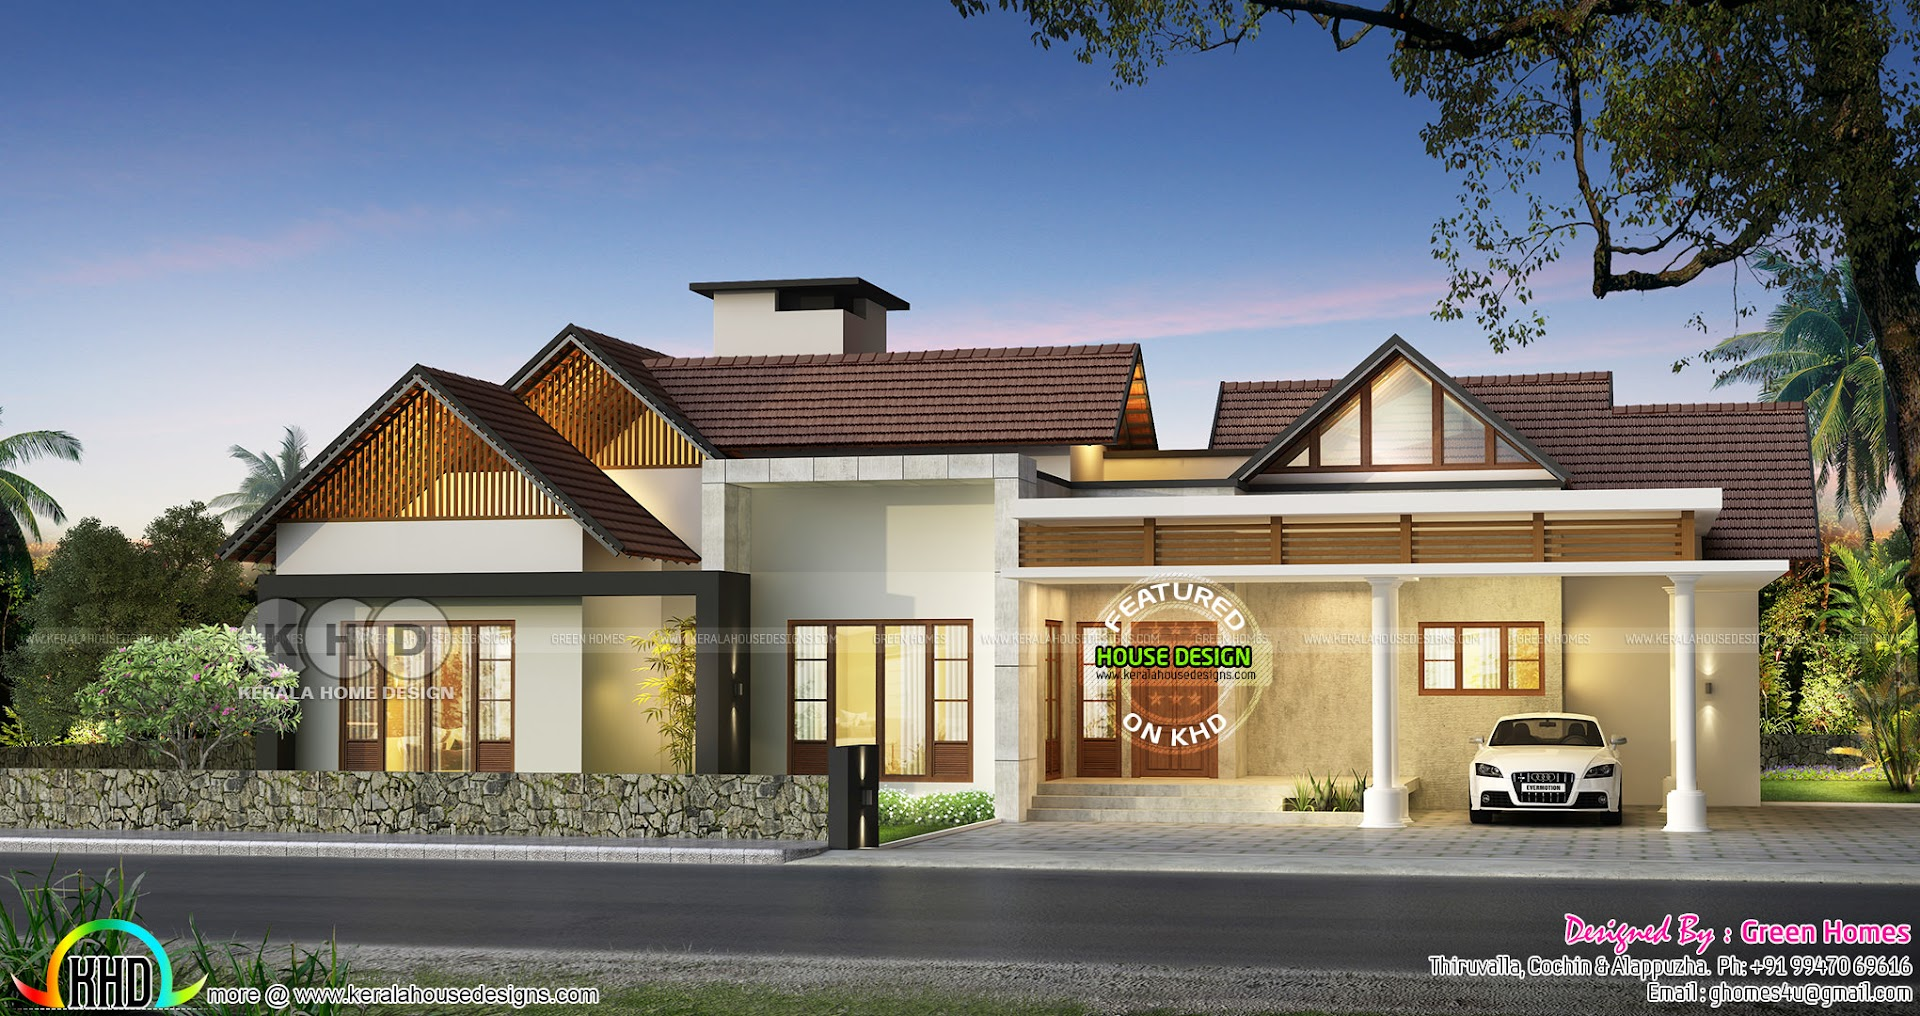 Big Single Floor House In Sloped Roof Style Kerala Home Design Bloglovin